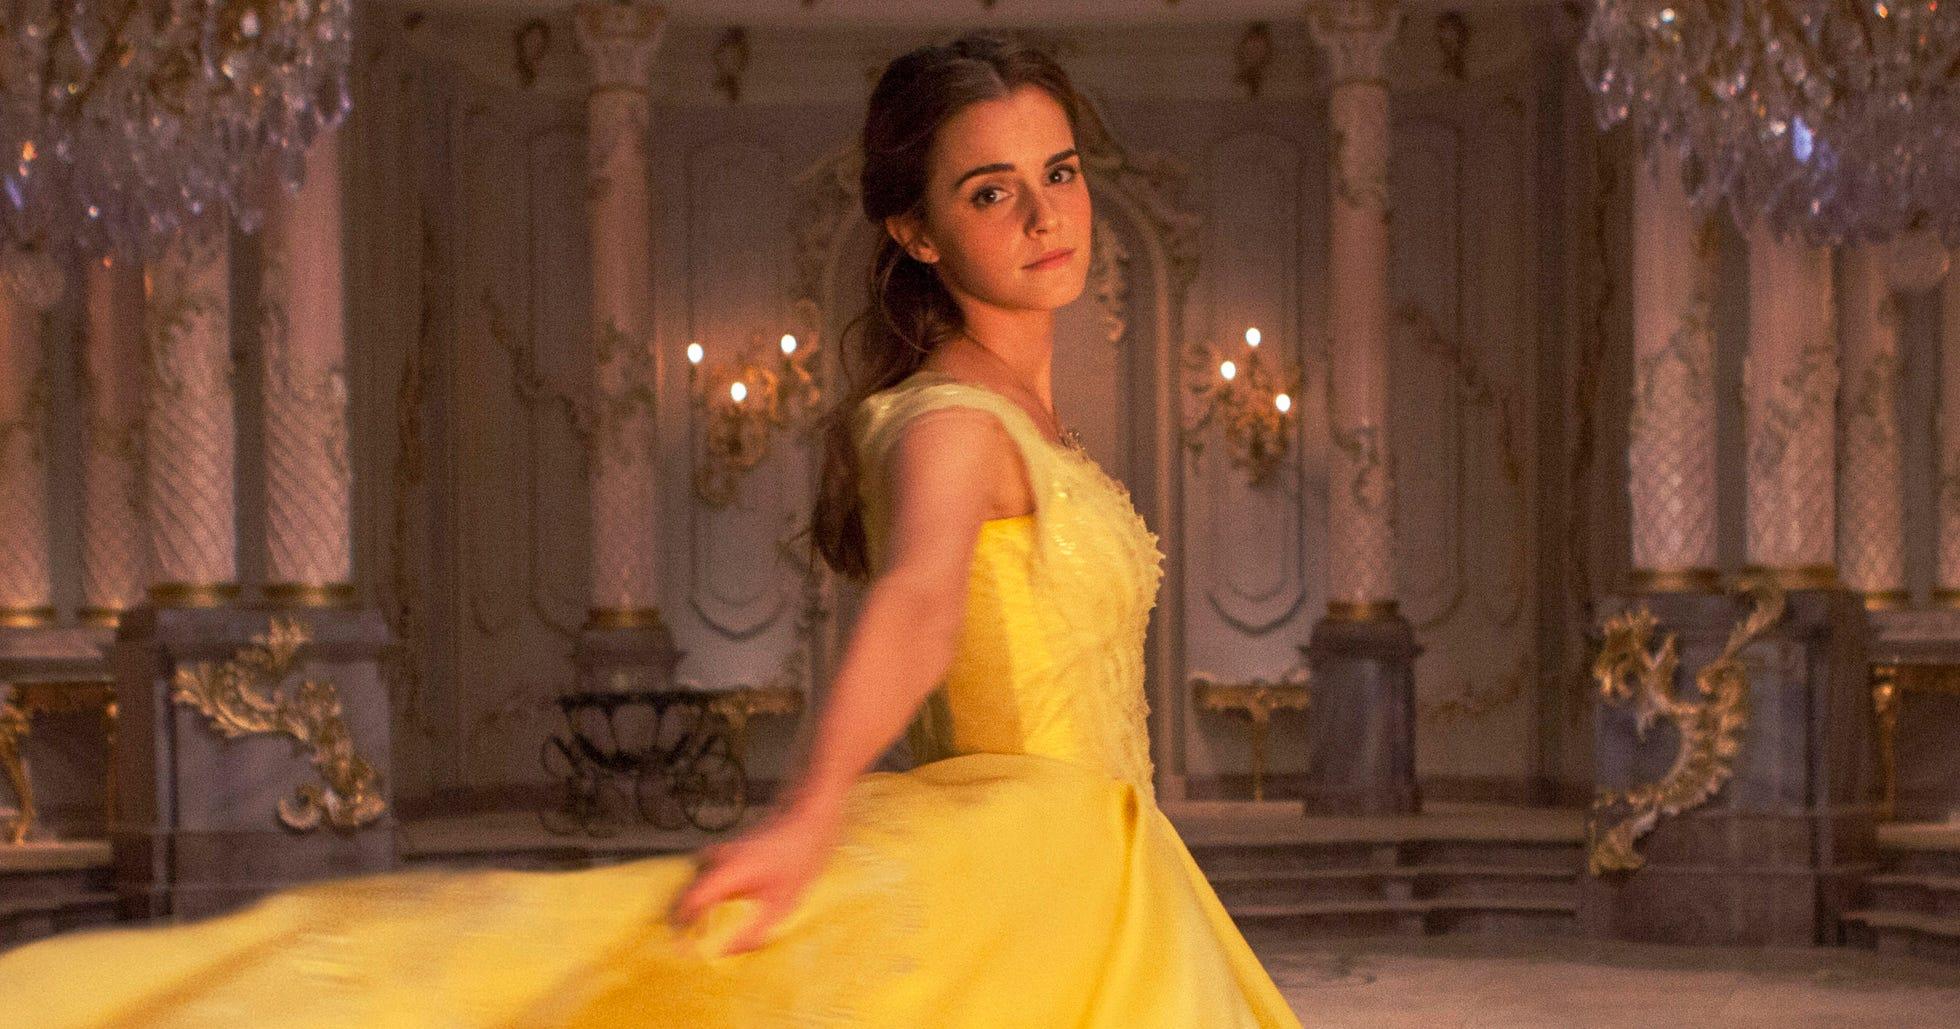 Emma Watson Belle Dress Beauty and the Beast Photo